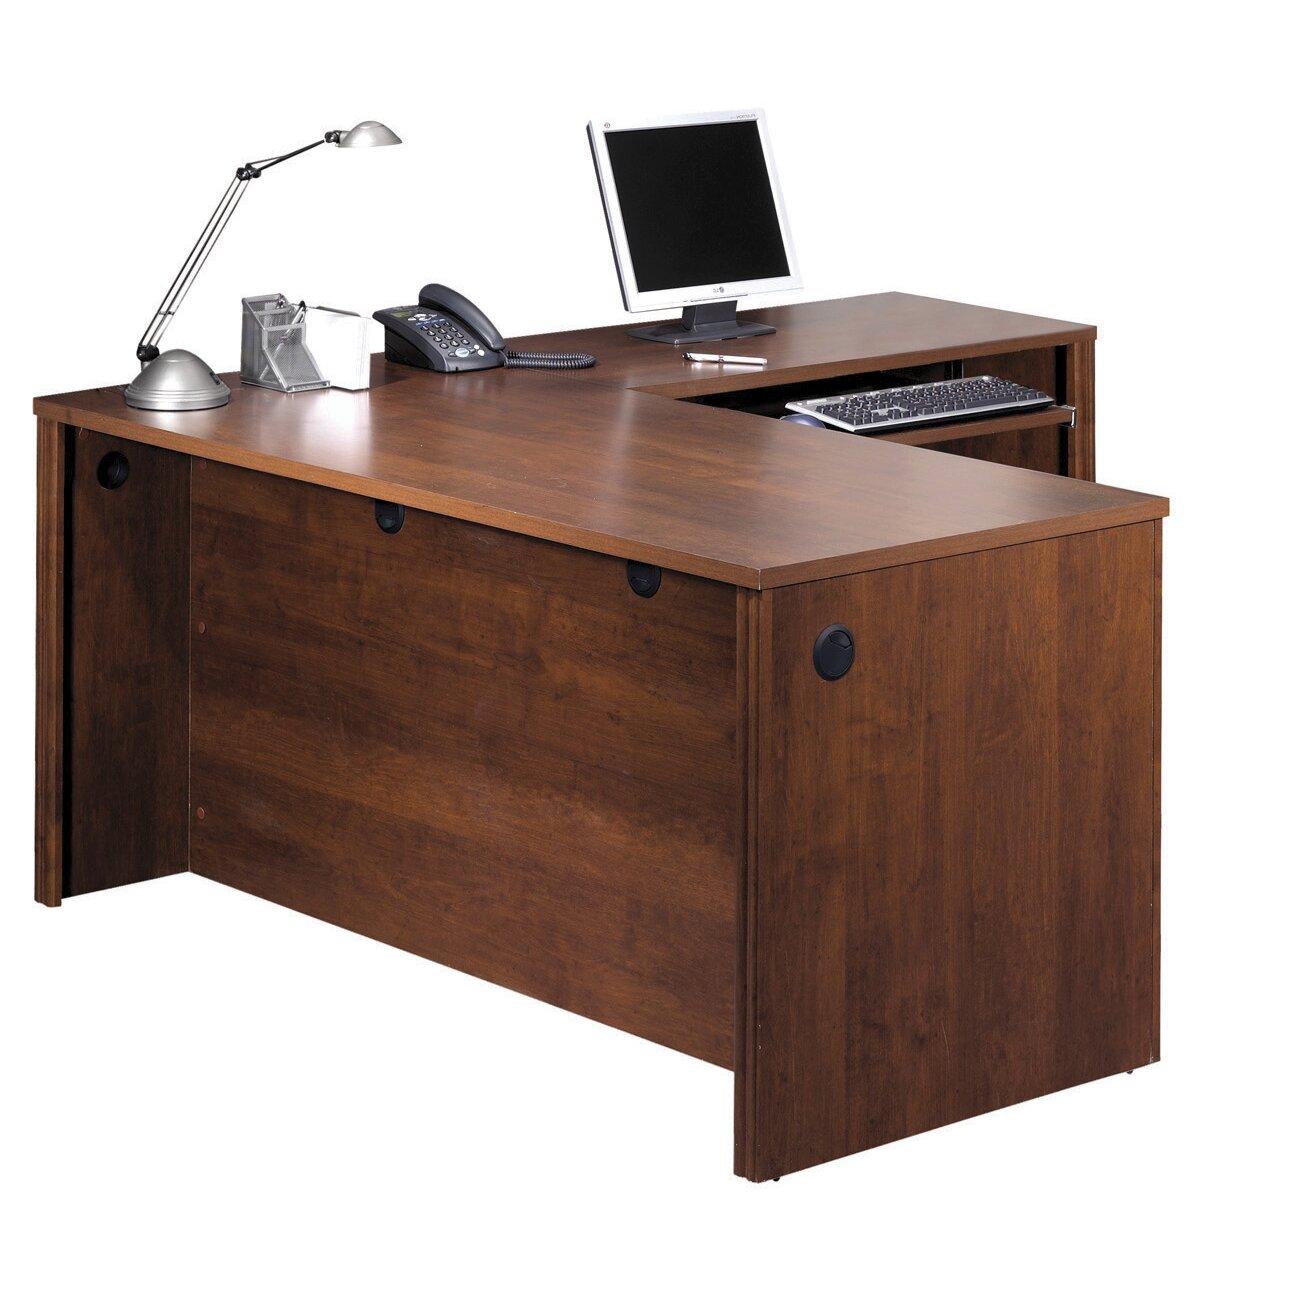 L Shaped Outdoor Kitchen: Bestar Embassy L-Shaped Executive Desk